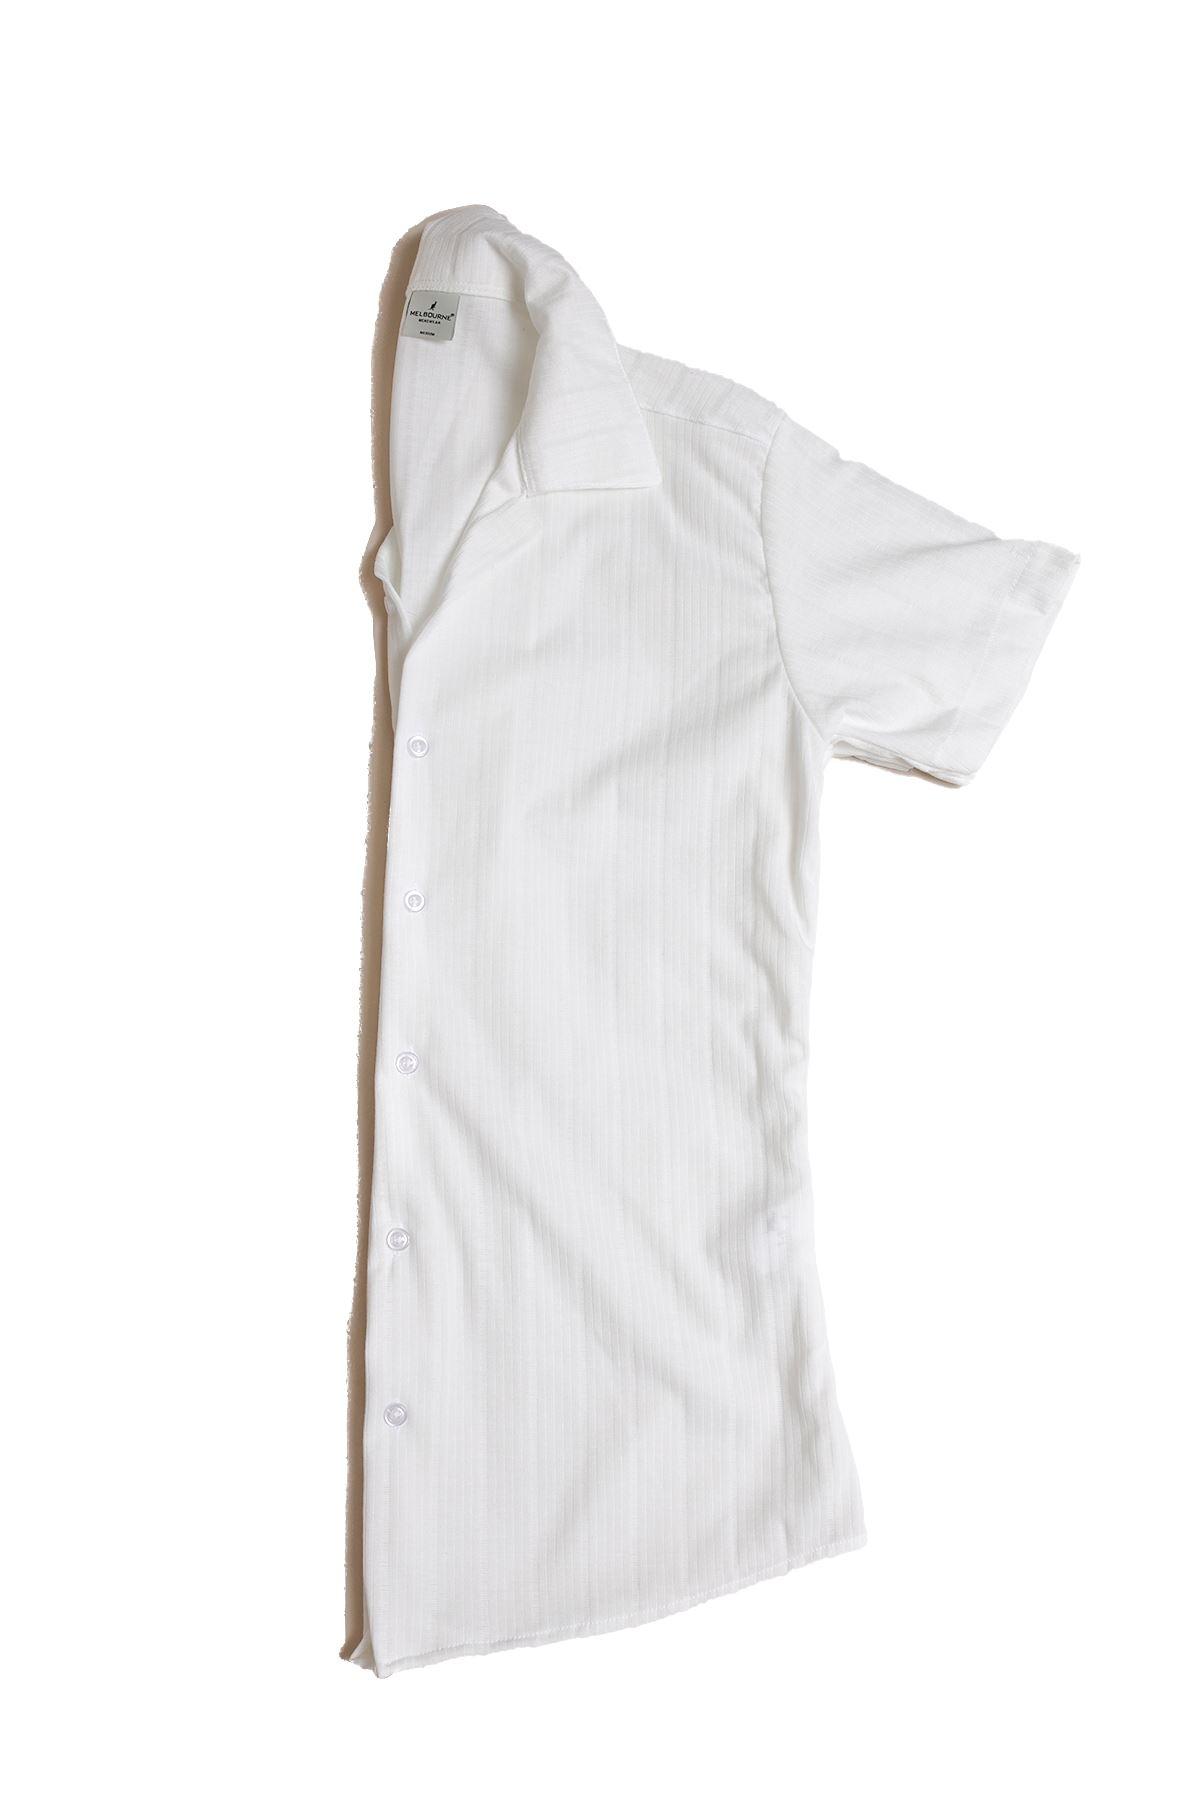 Beyaz Triko Gömlek